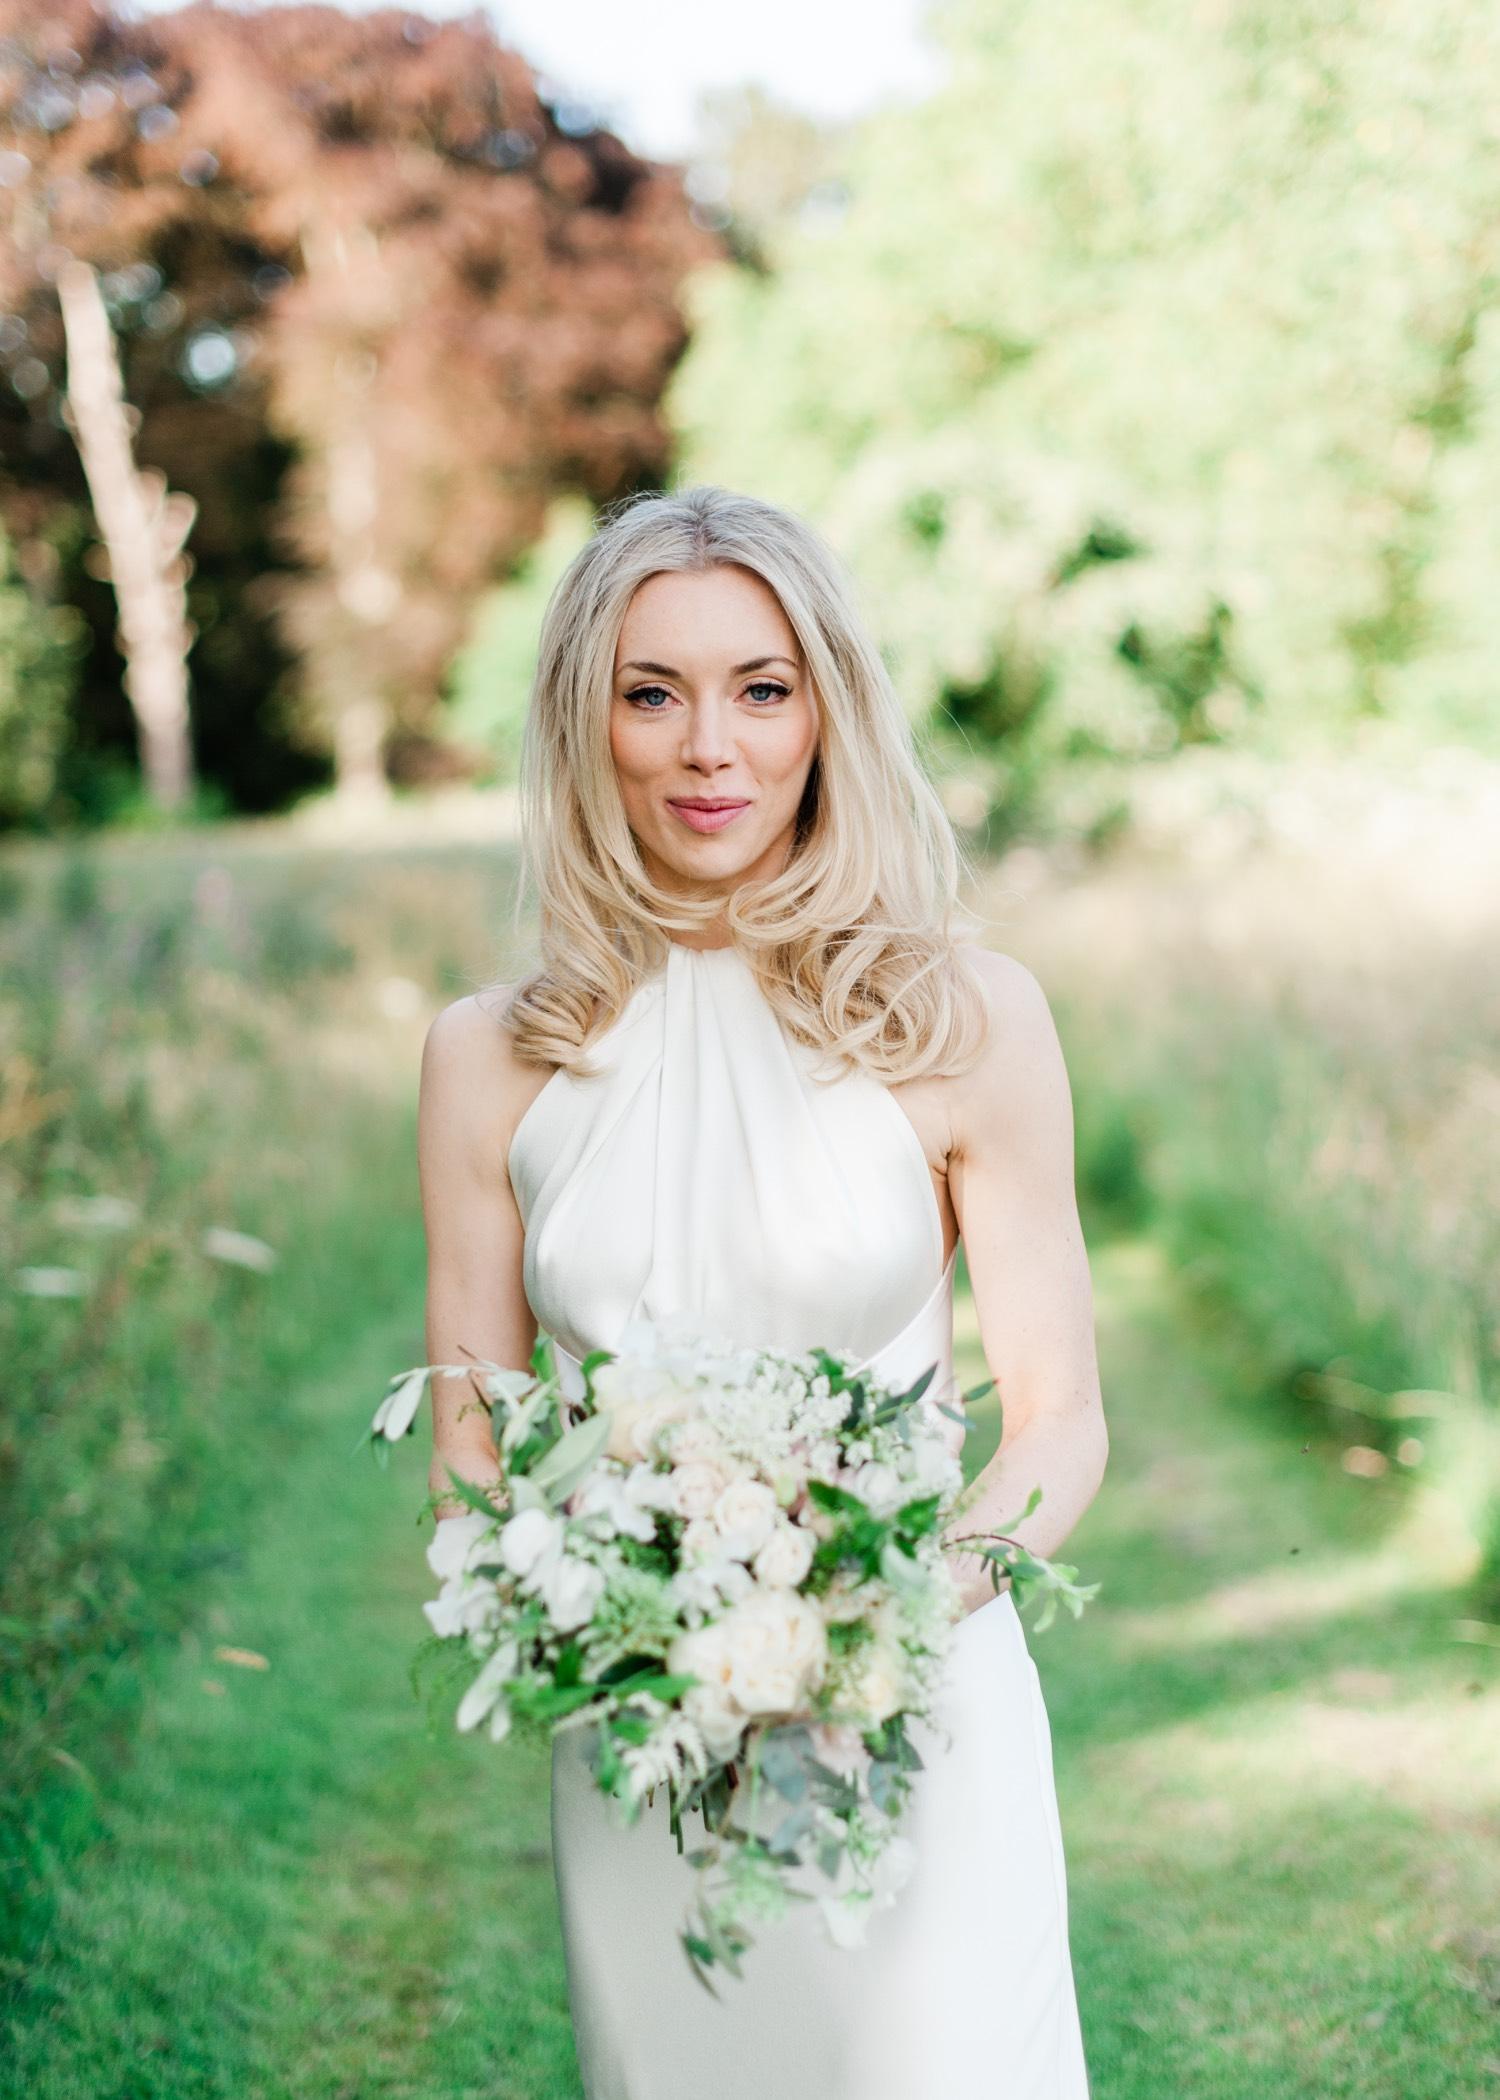 Littleton-Rose-Syon-House-London-Wedding-Planner-bridal.jpg